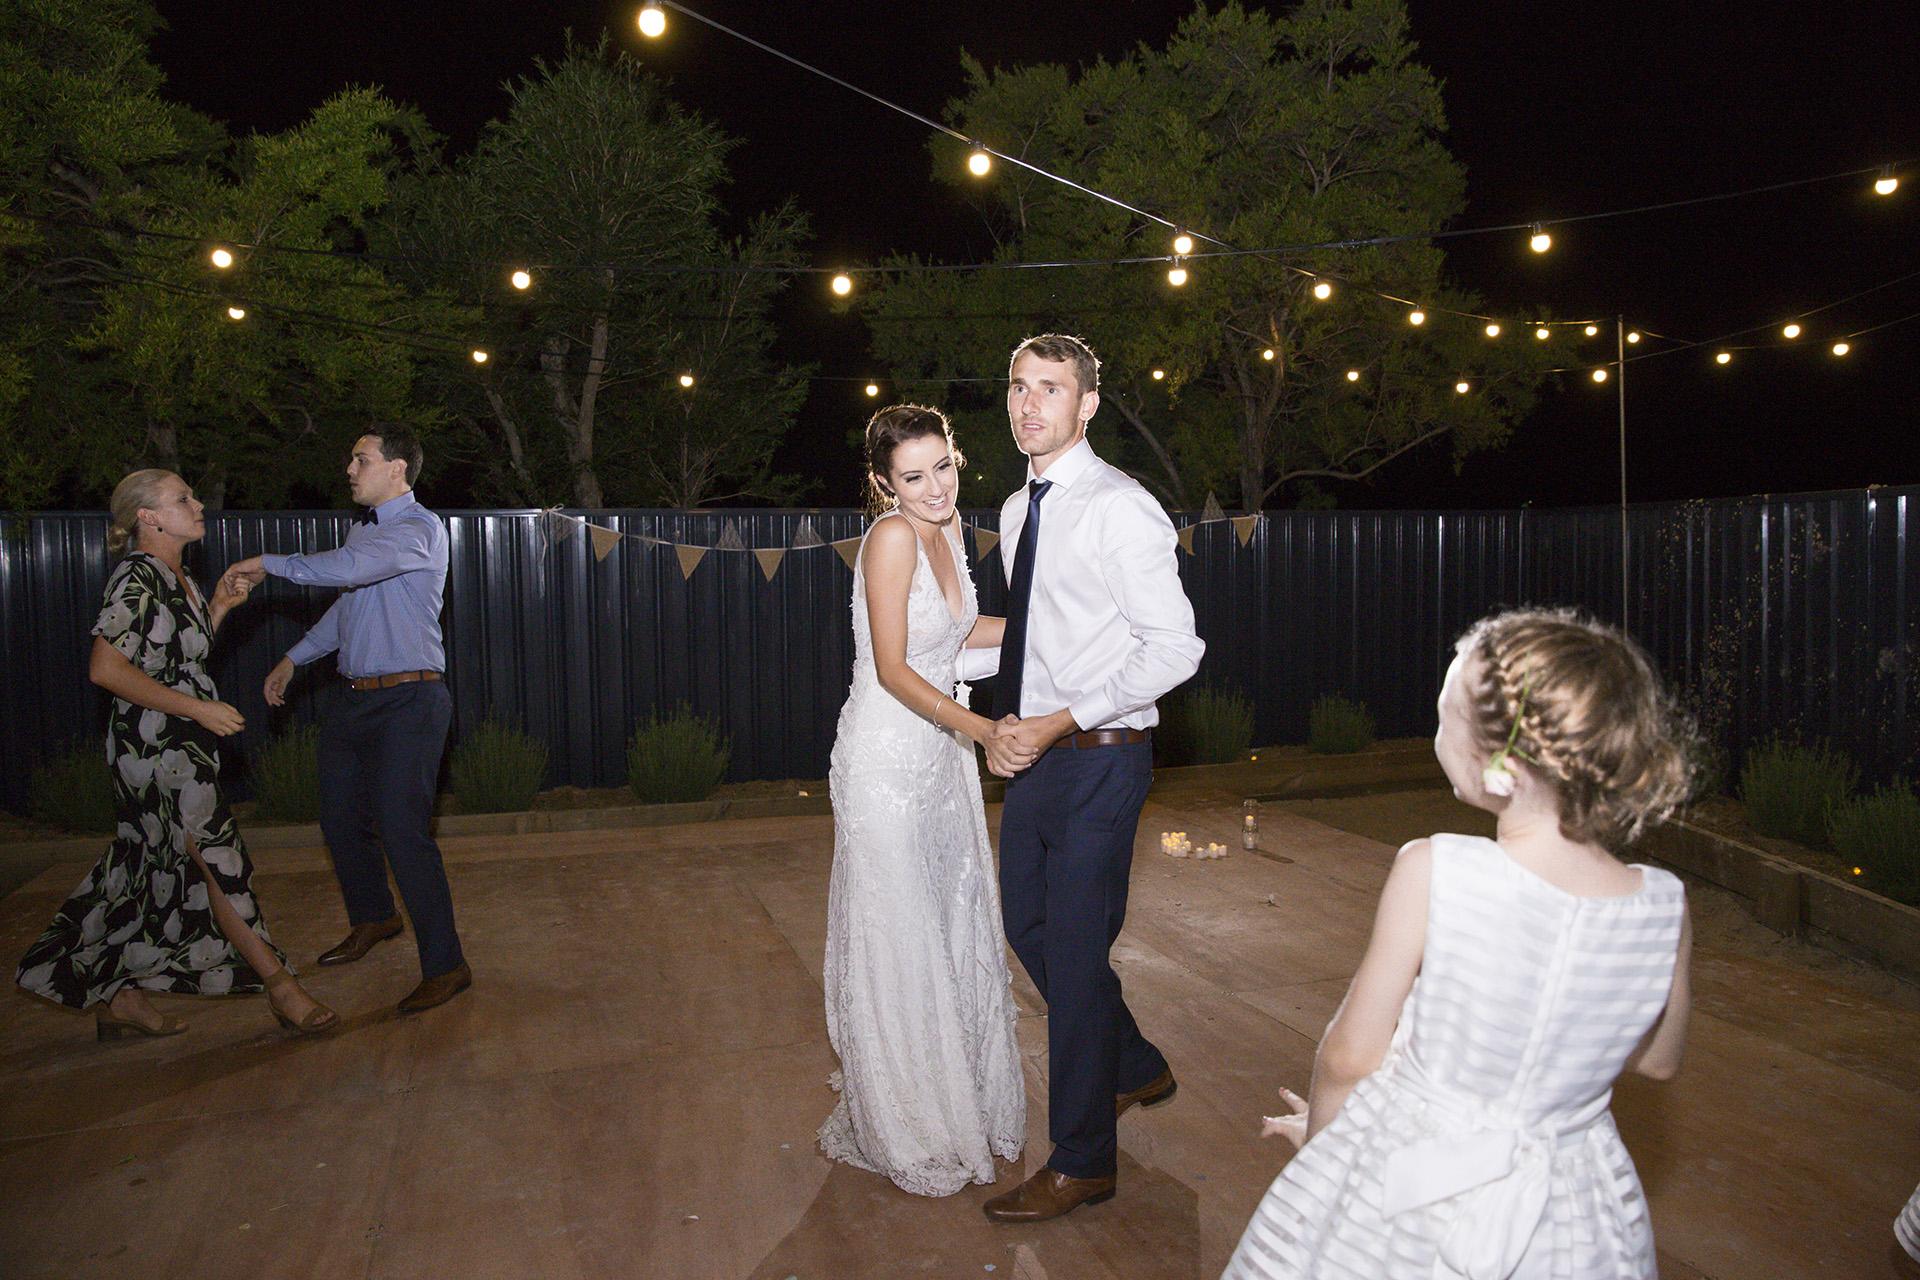 backyard wedding dance